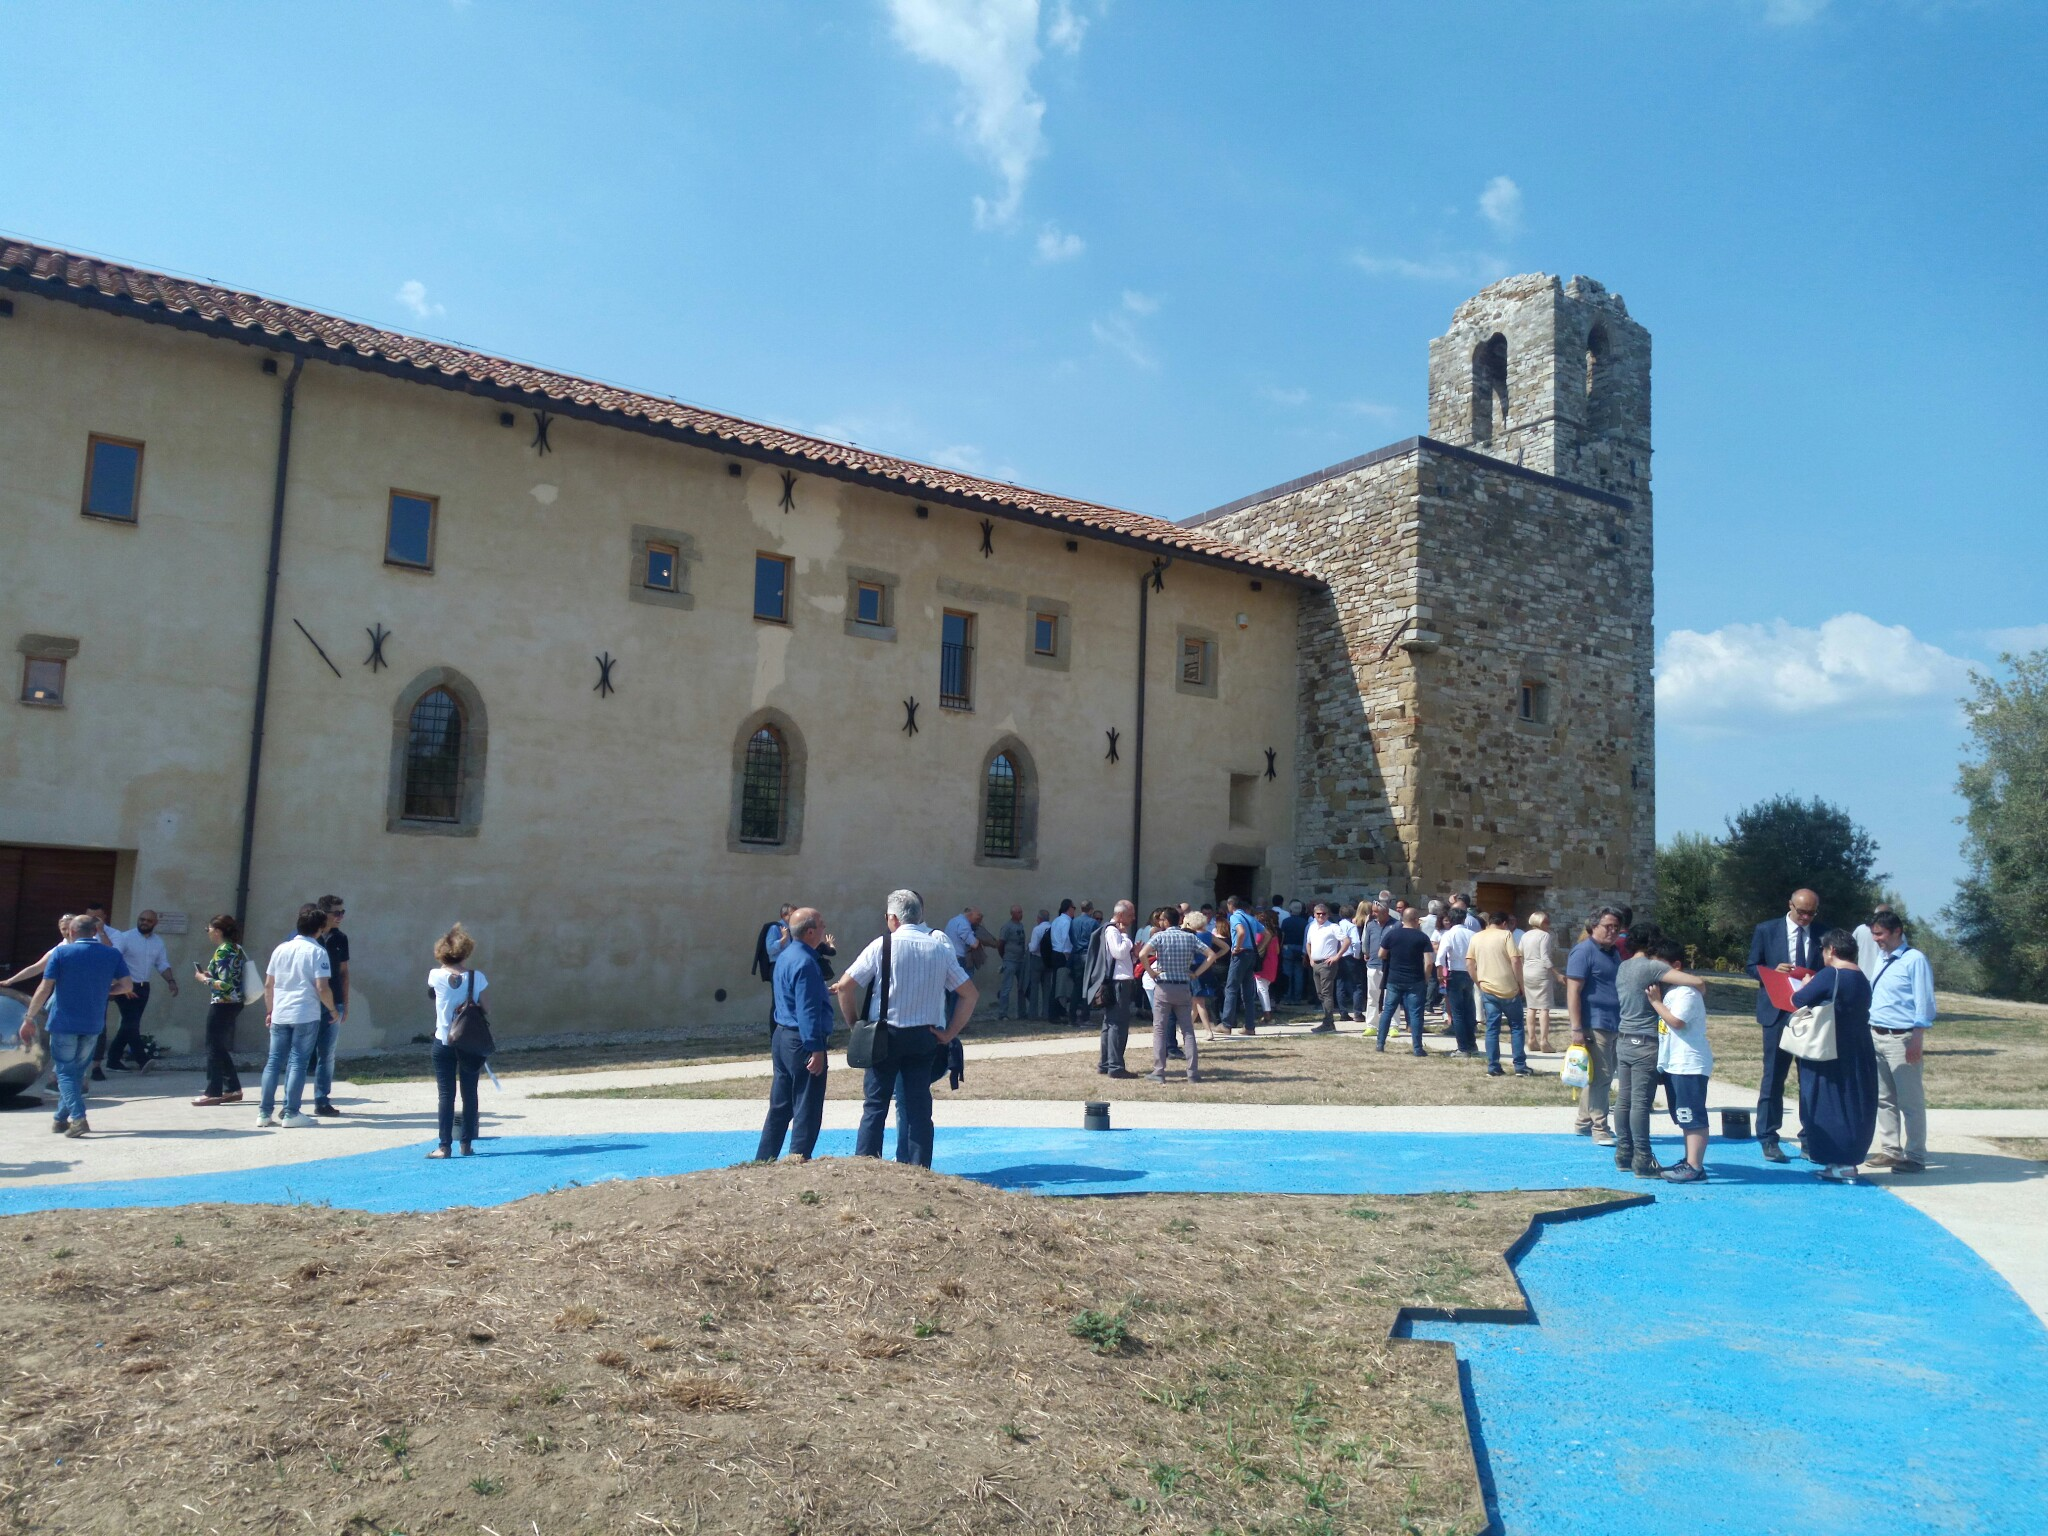 convento olivetani isola polvese lago trasimeno